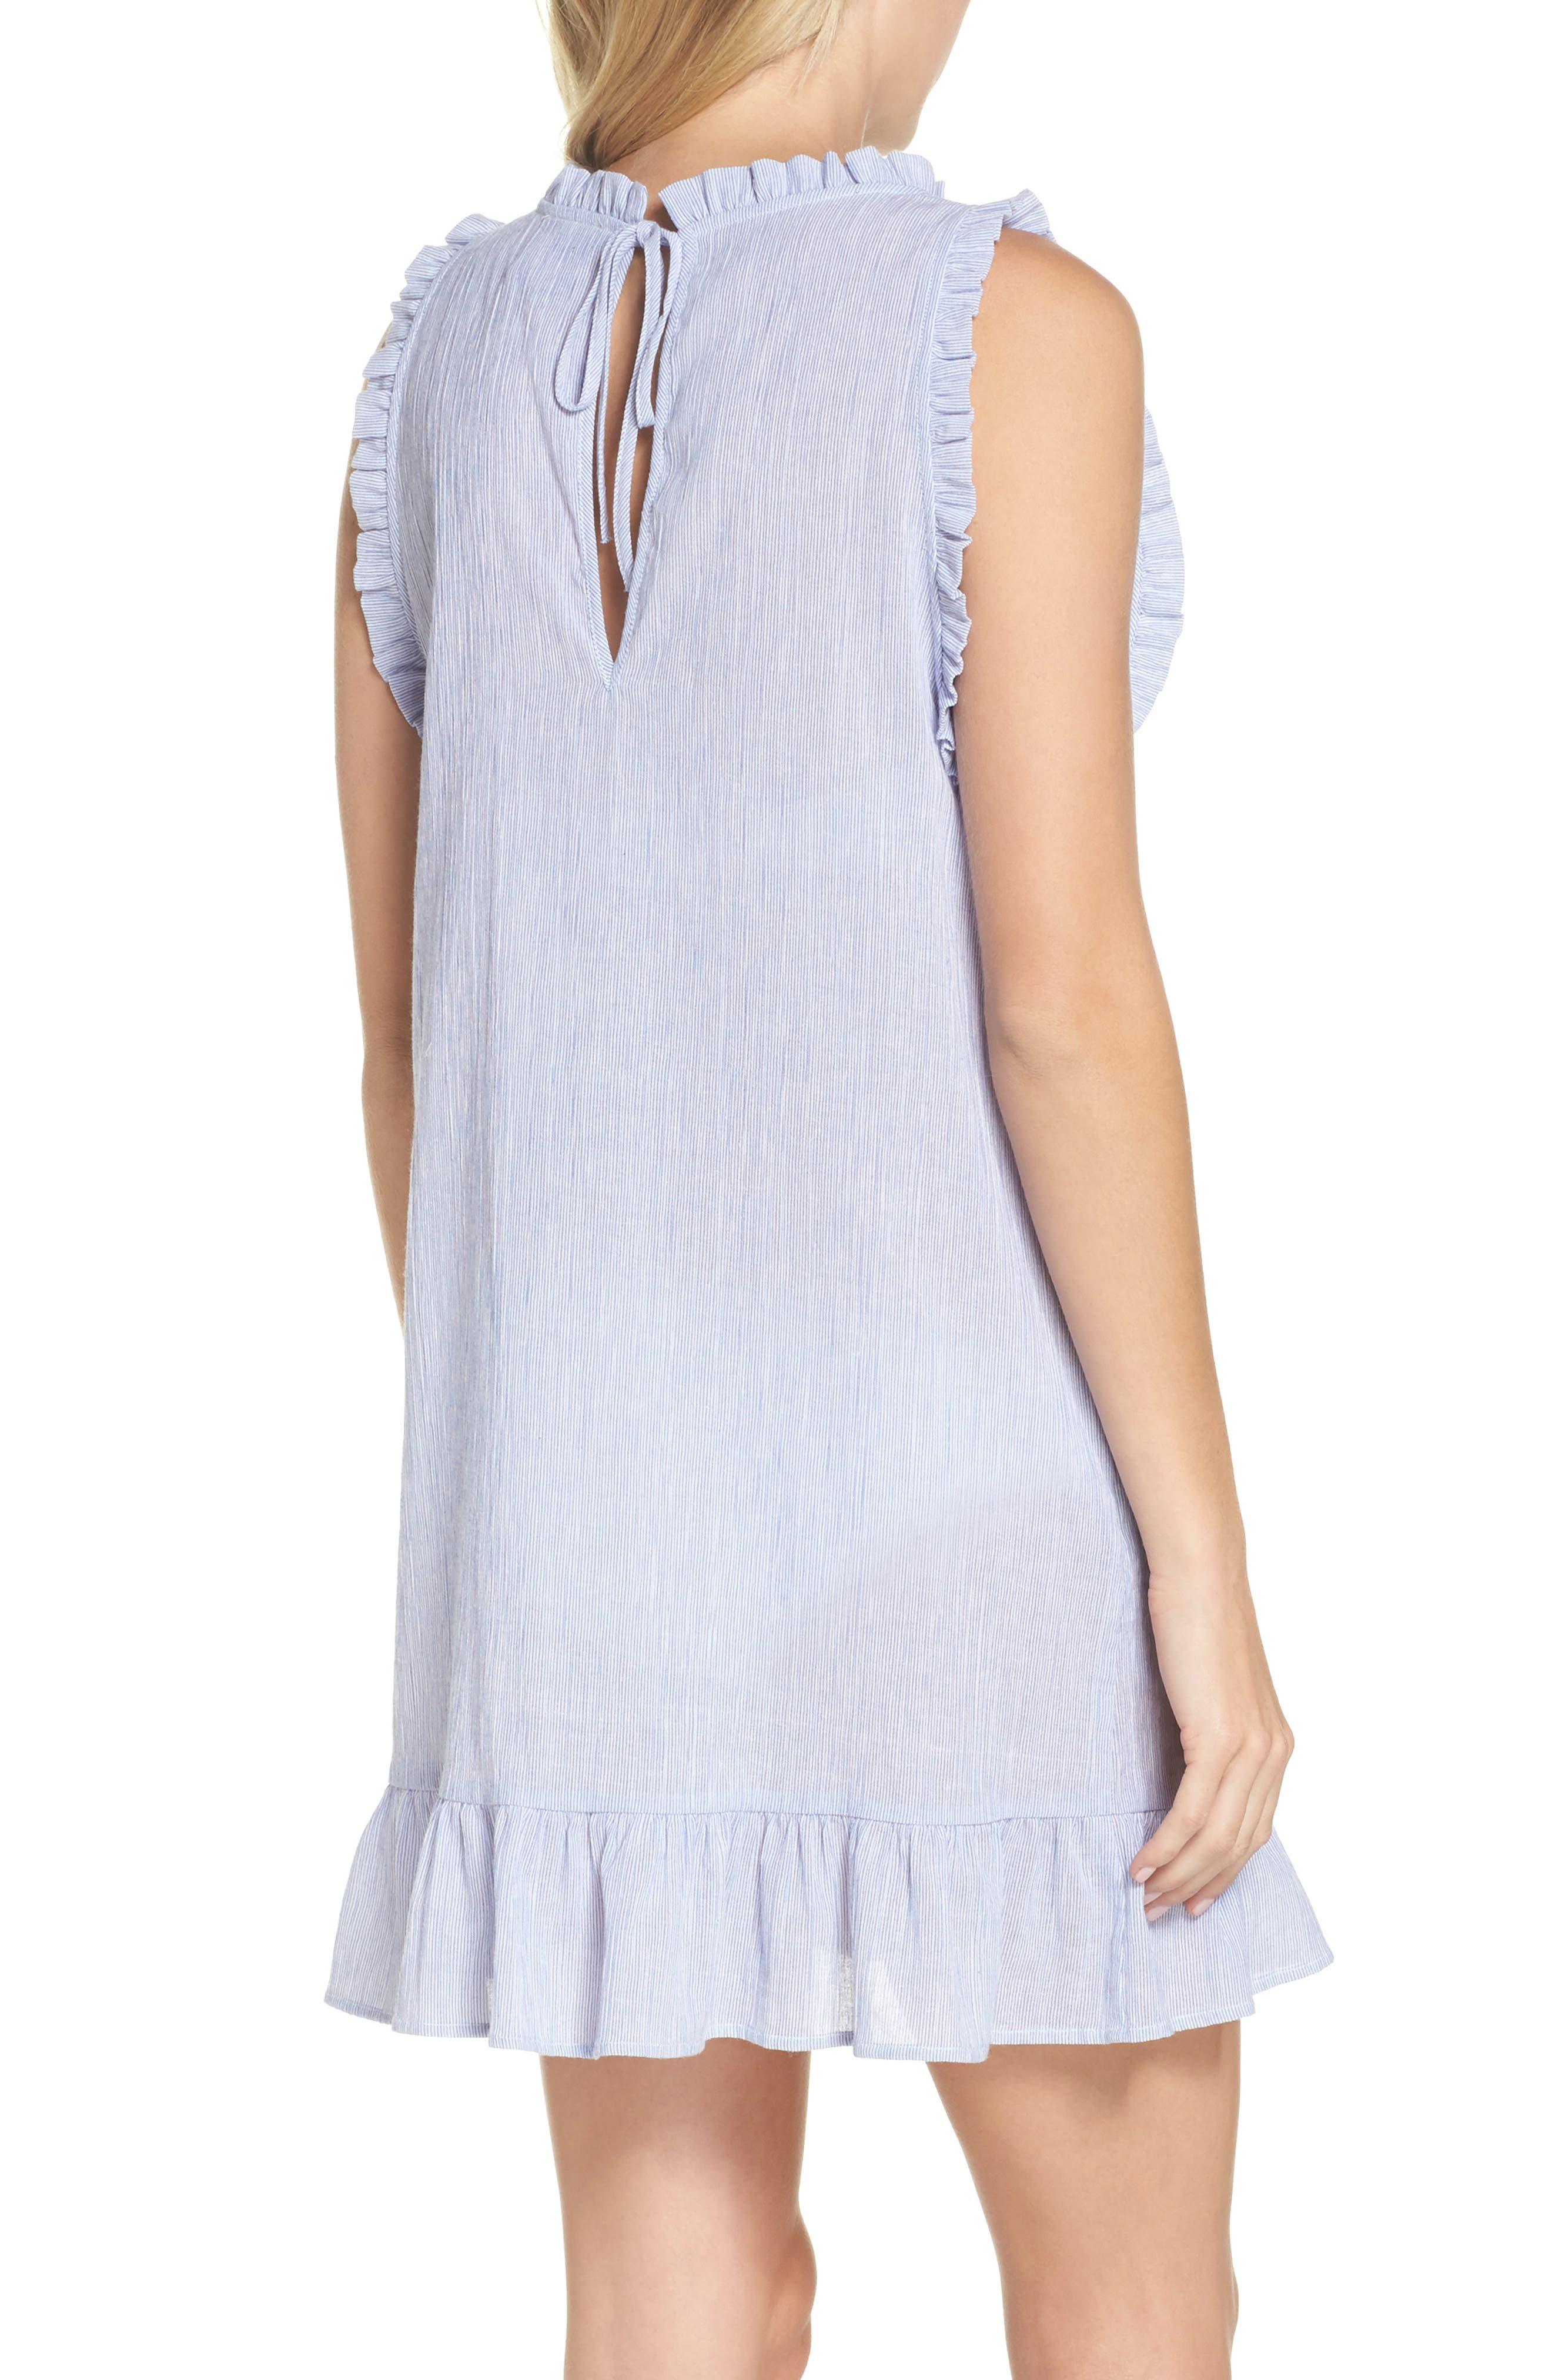 Heidi Cover-Up Dress,                             Alternate thumbnail 2, color,                             Blue/ White